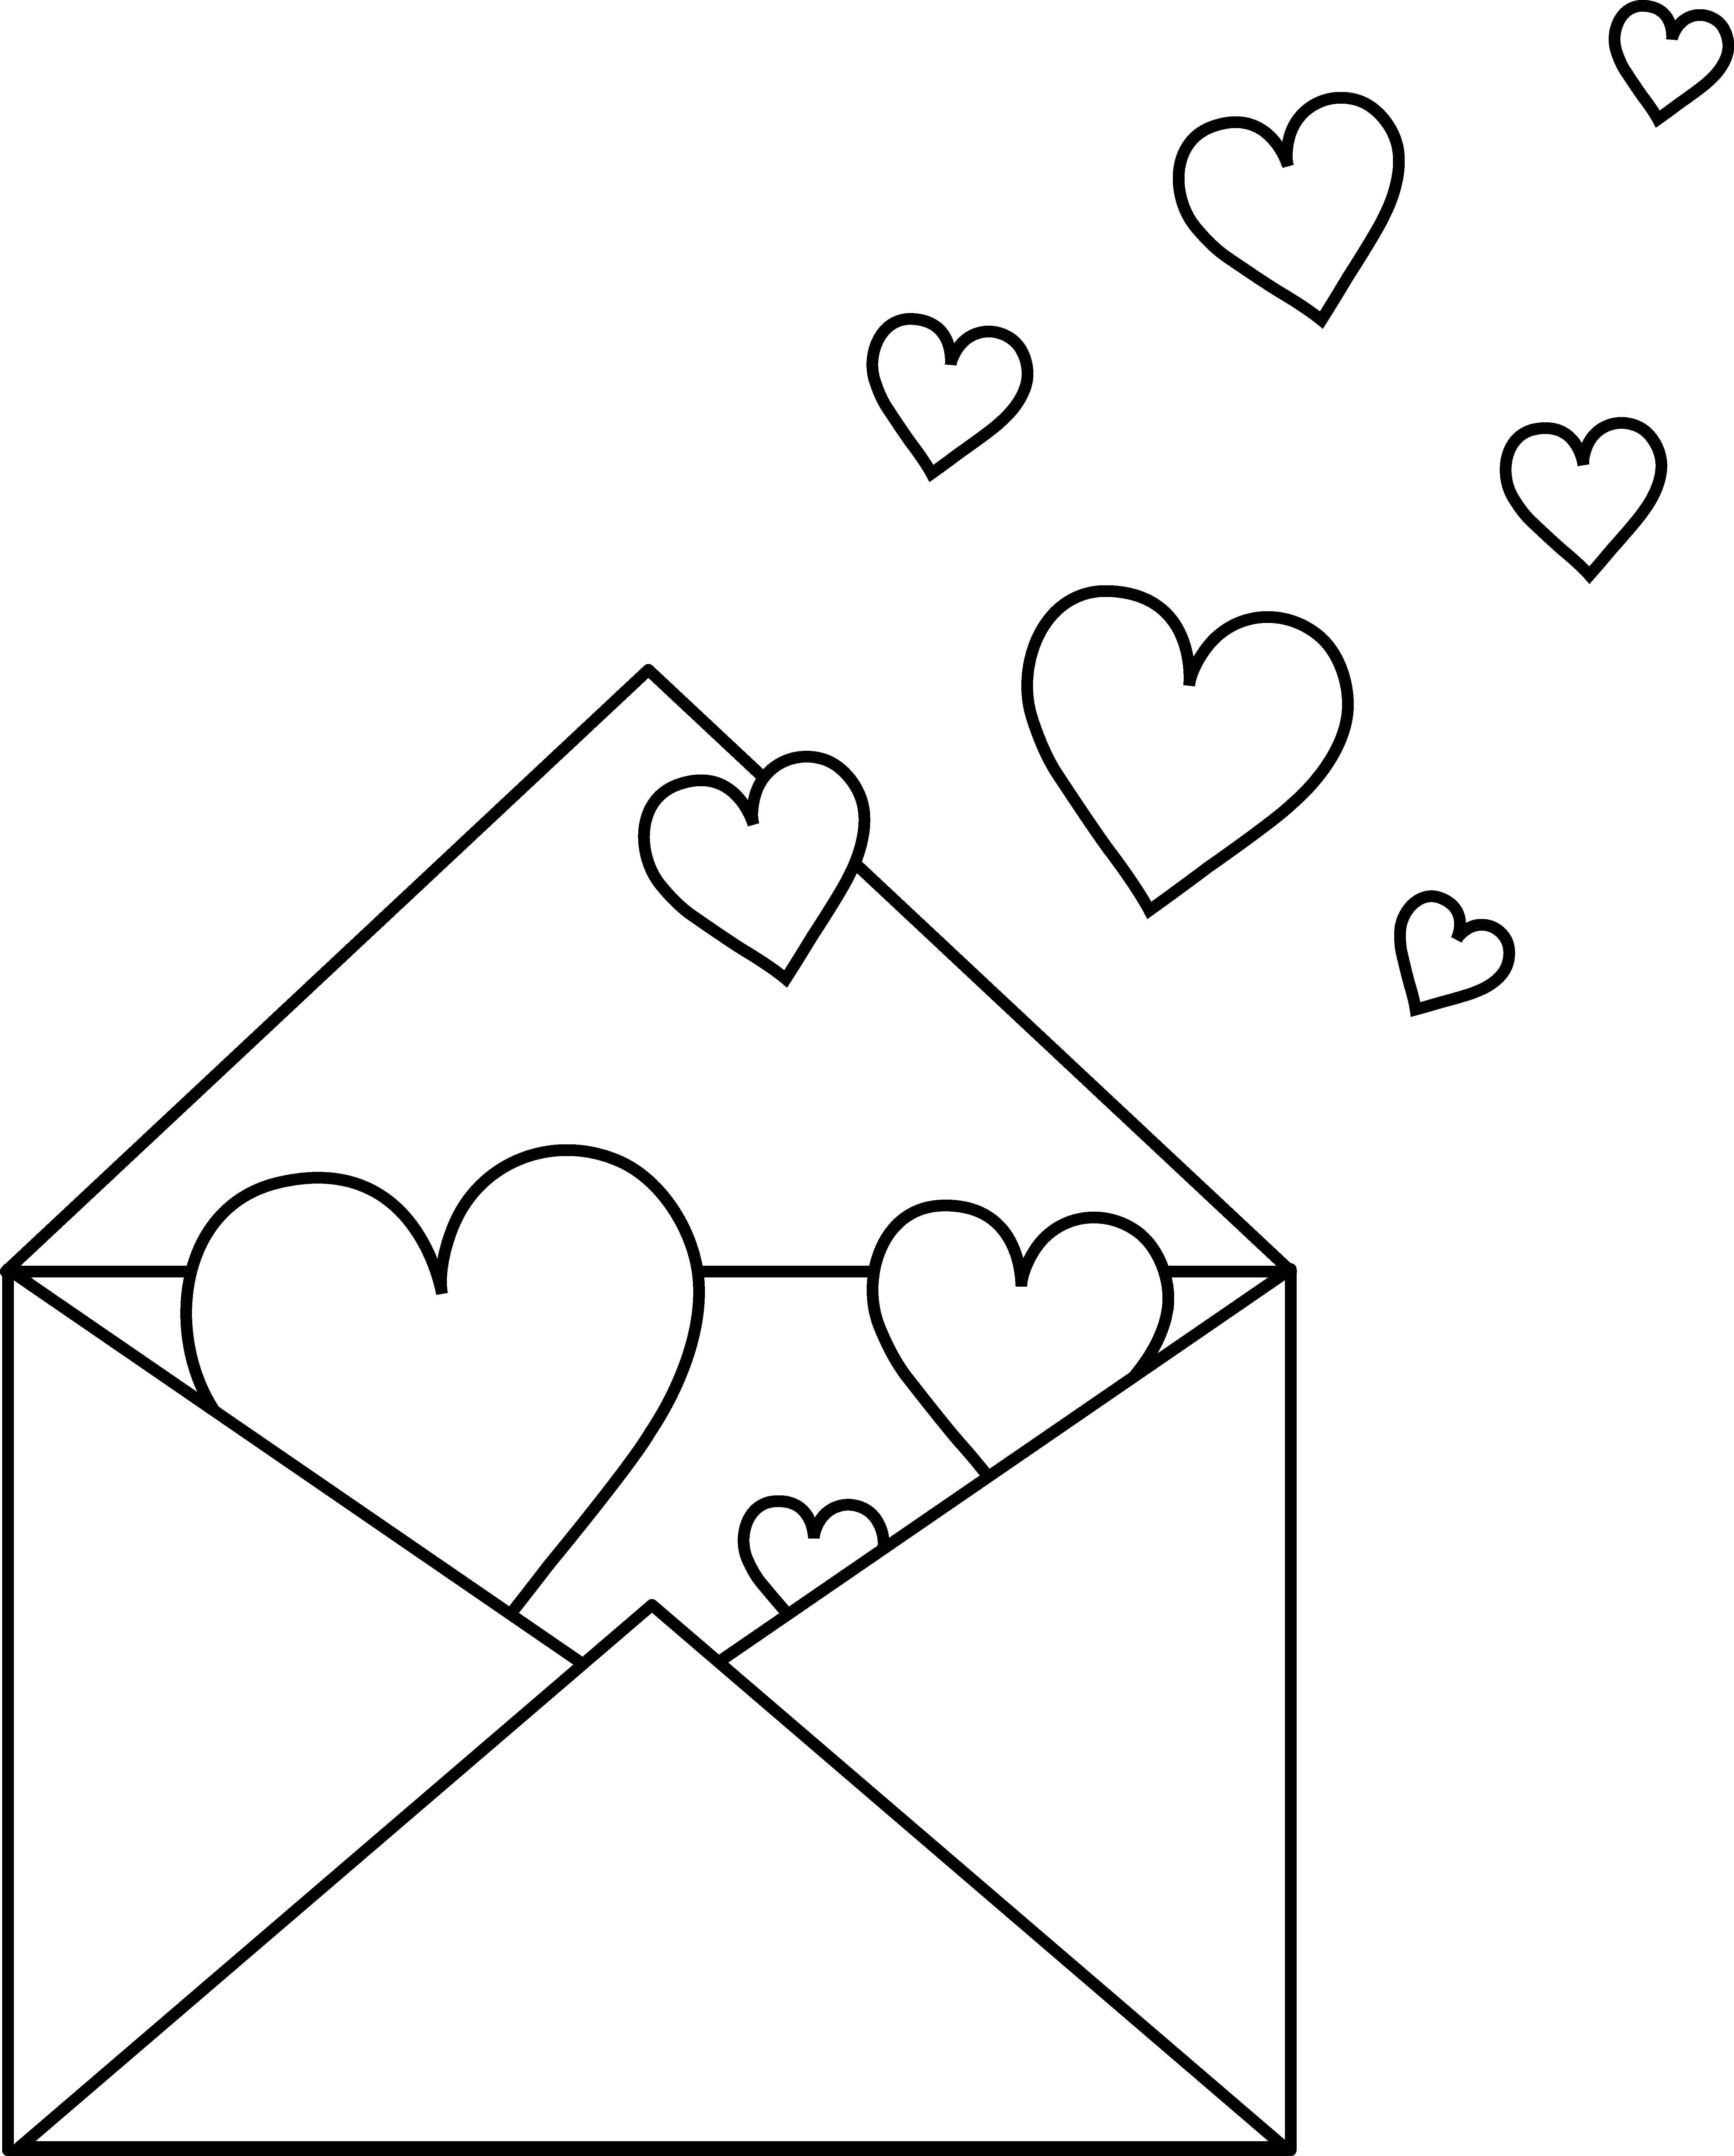 Colorable Love Letter Free Clip Art Clip Art Free Clip Art Coloring Pages